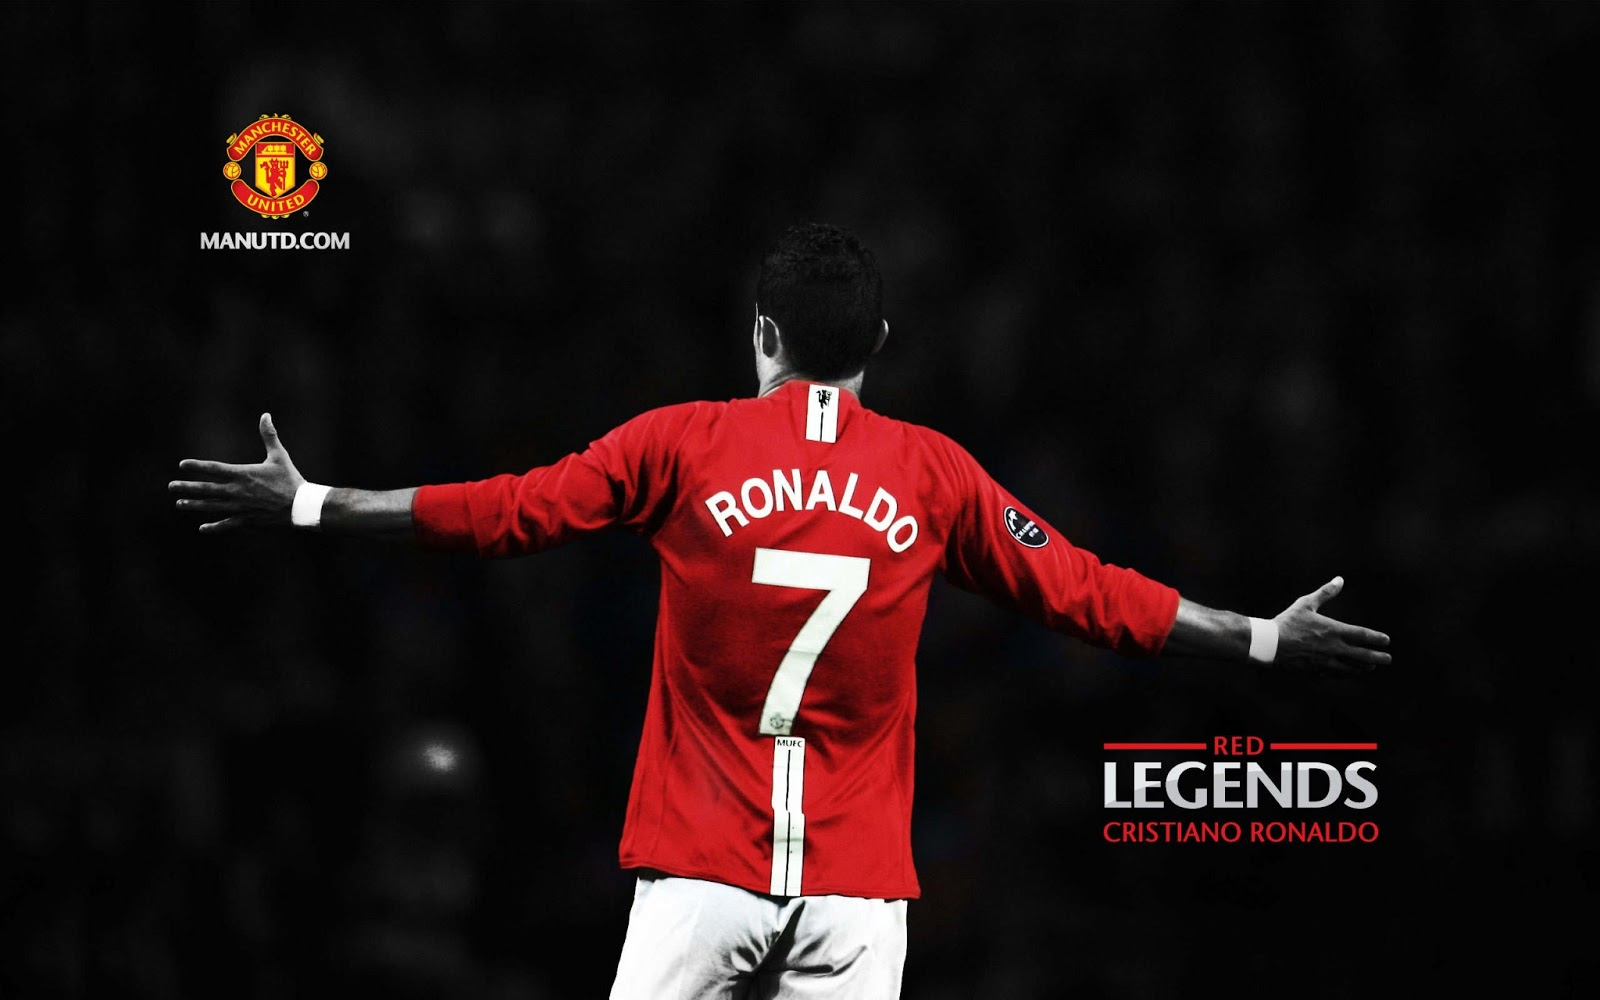 Ronaldo Manchester United Wallpaper HD Download Wallpaper 1600x1000